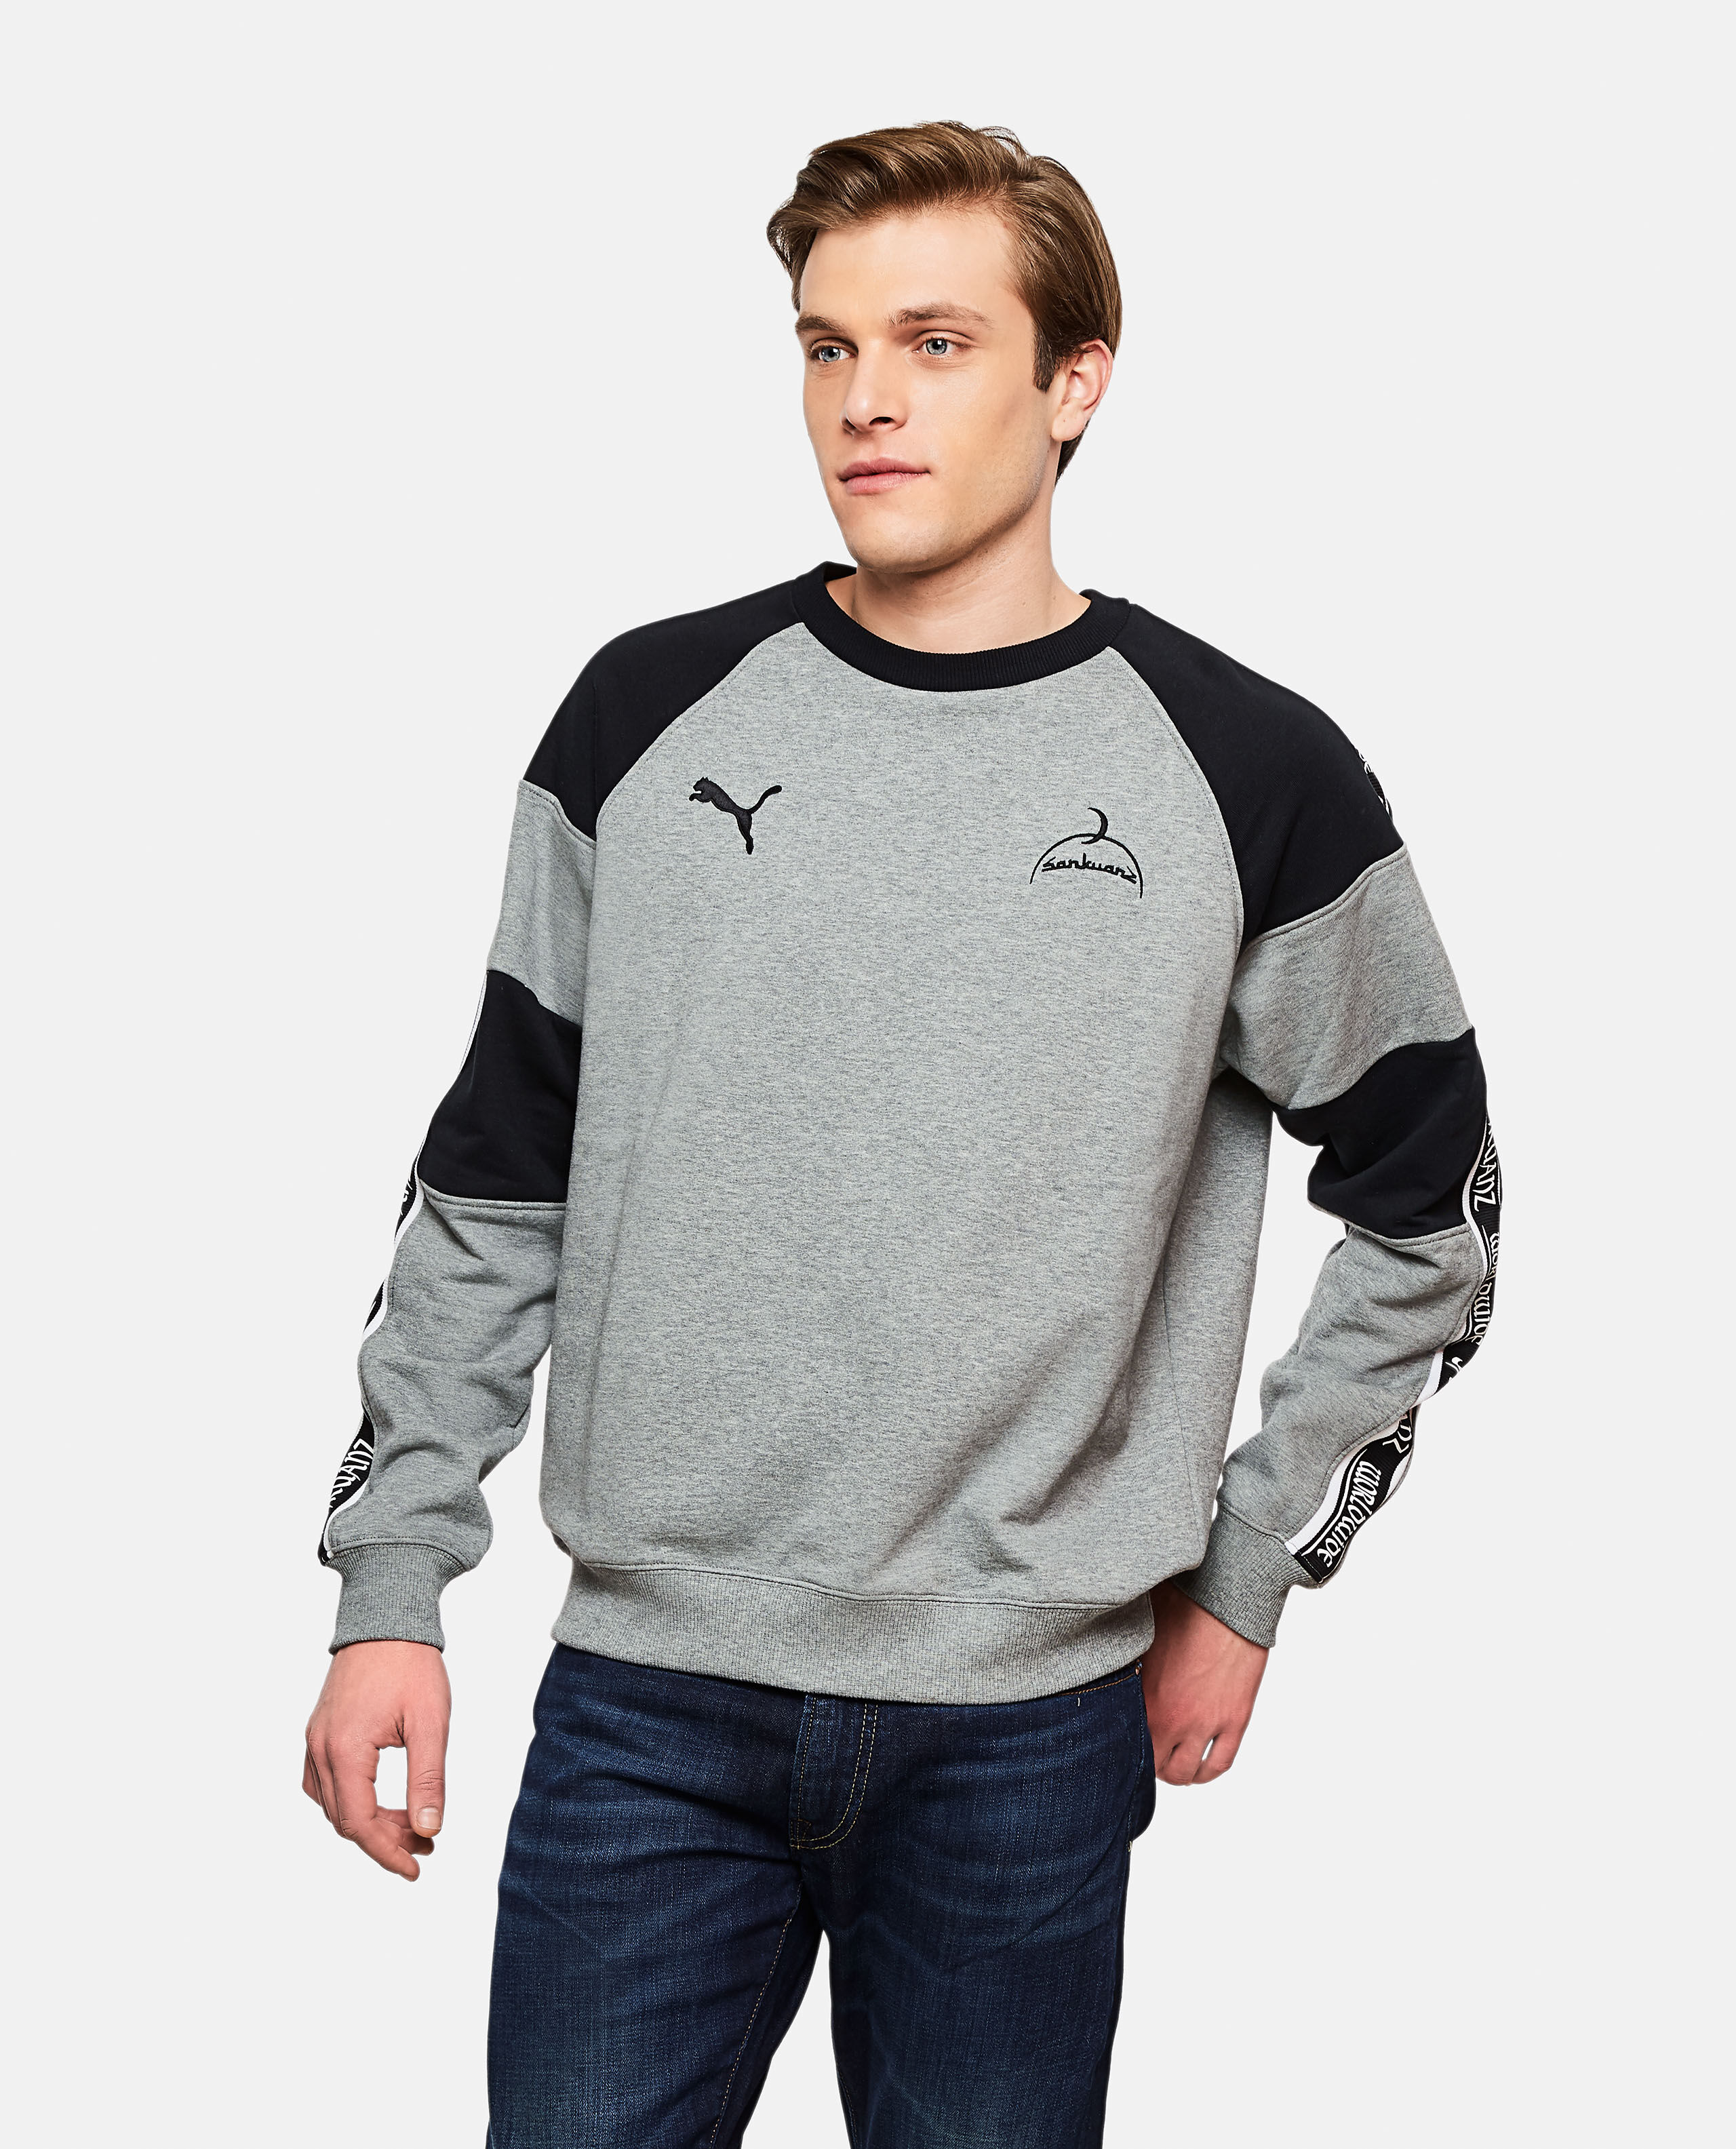 Puma X Sankuanz Crewneck Sweatshirt